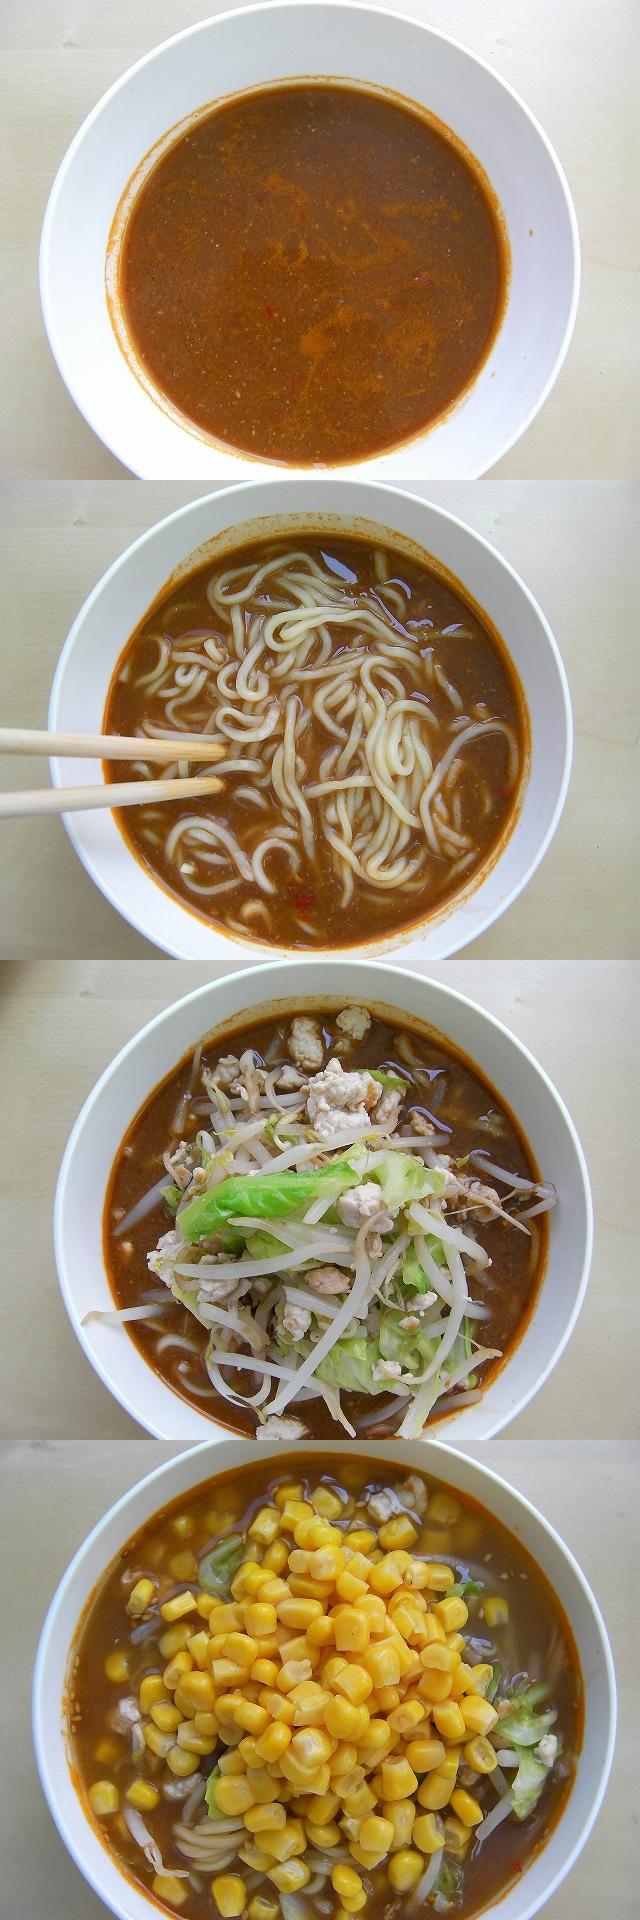 miso ramen (2)new5